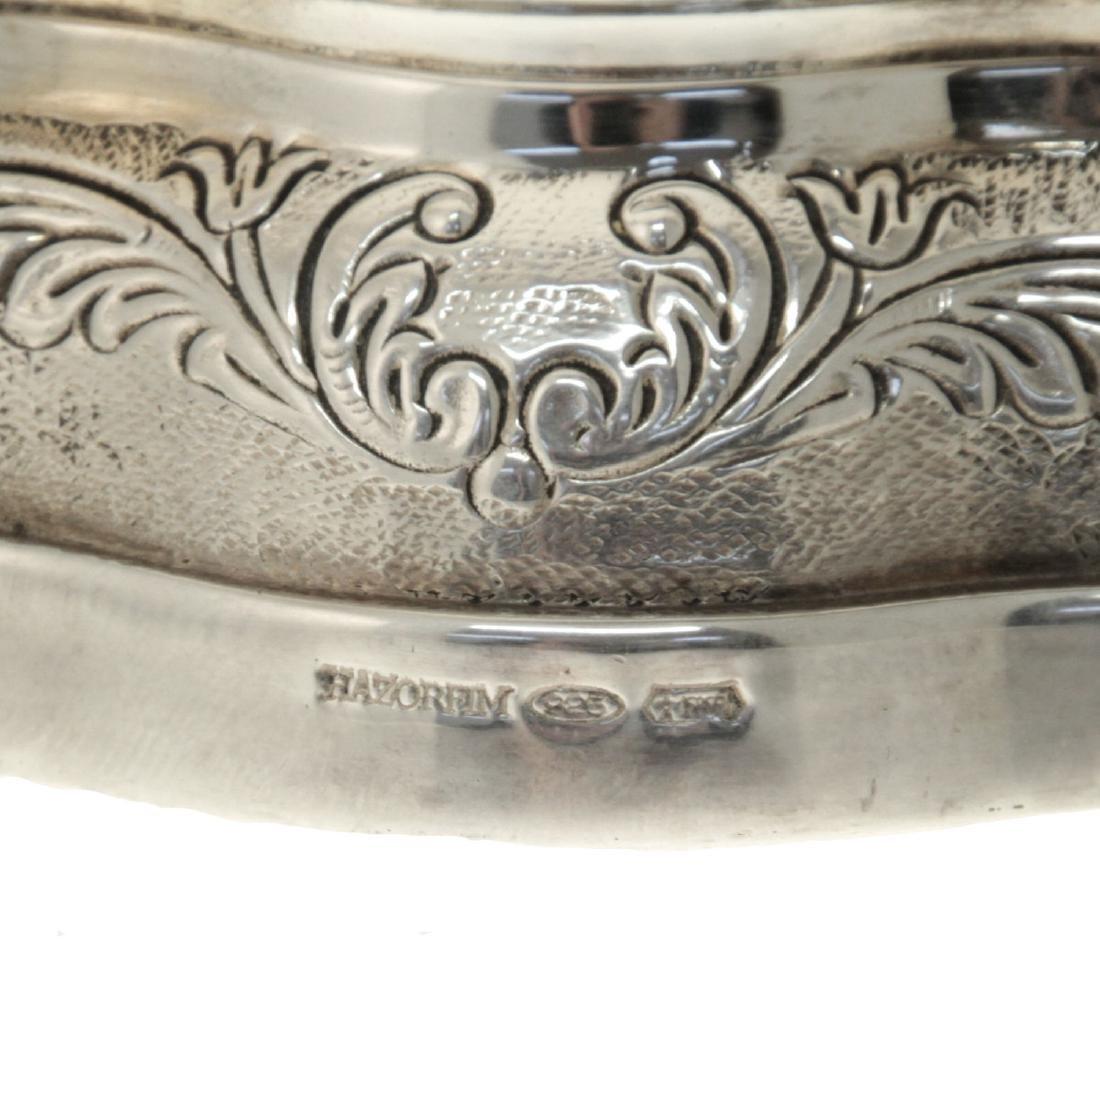 Hazorfim Sterling Silver Vase. - 4